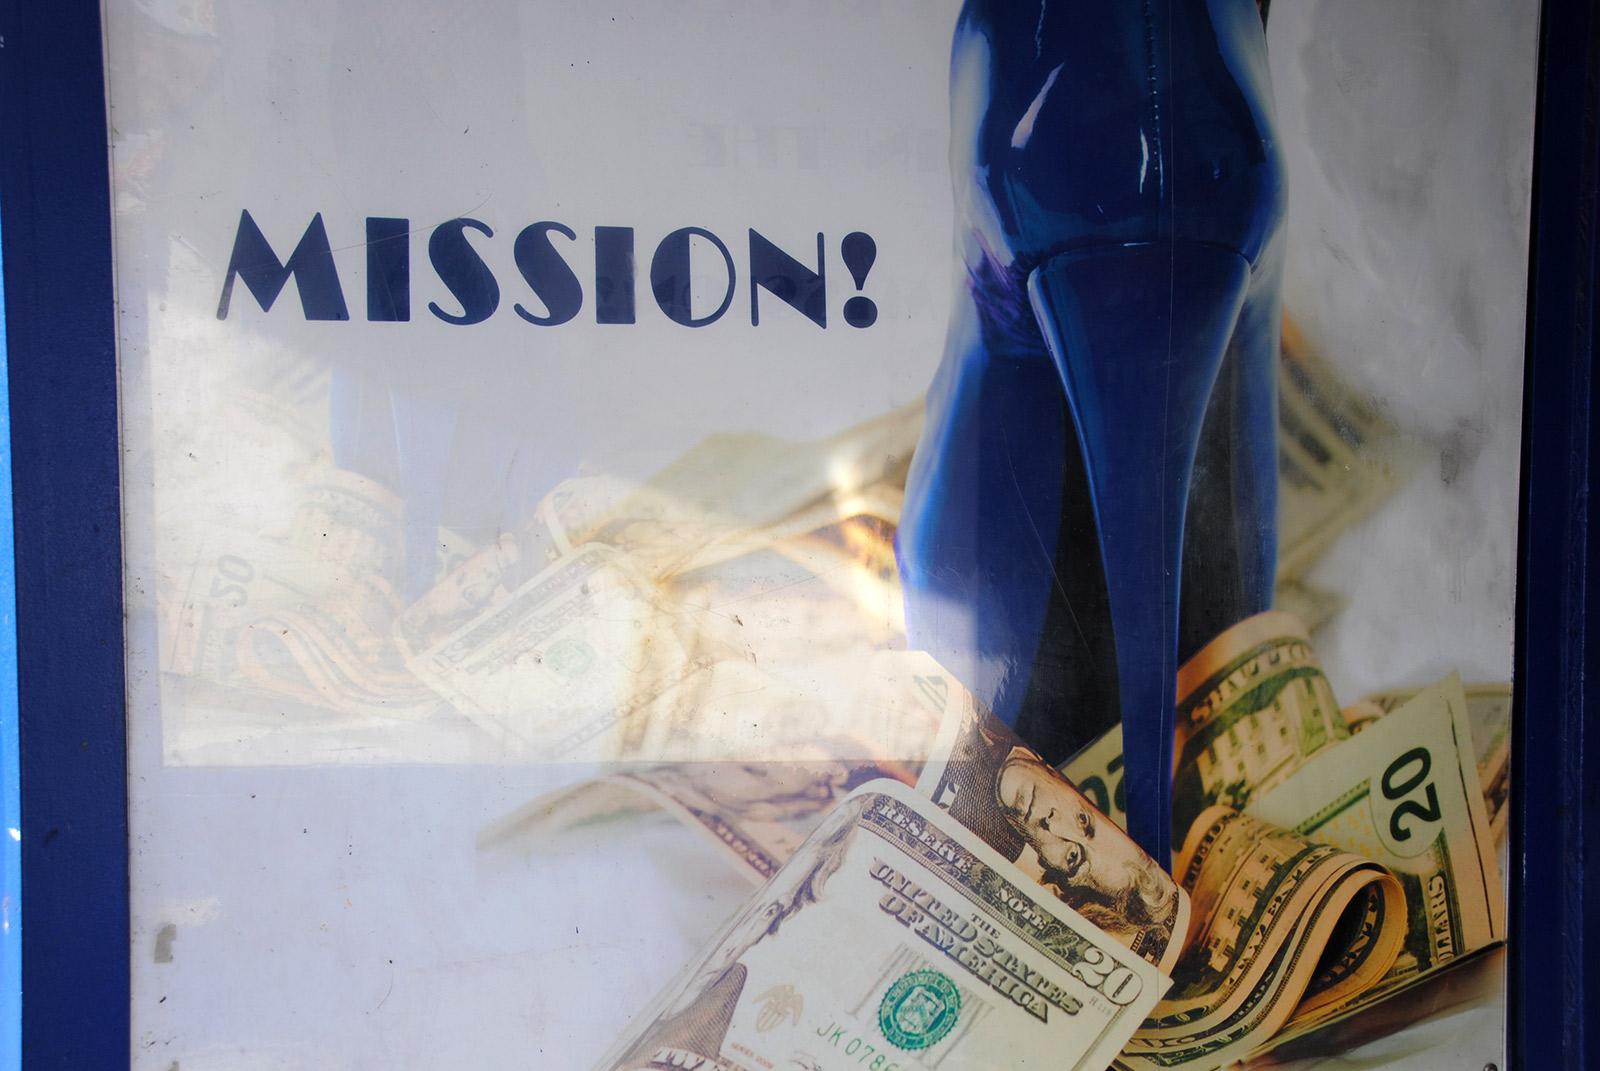 Image shows a blue stilleto standing on money